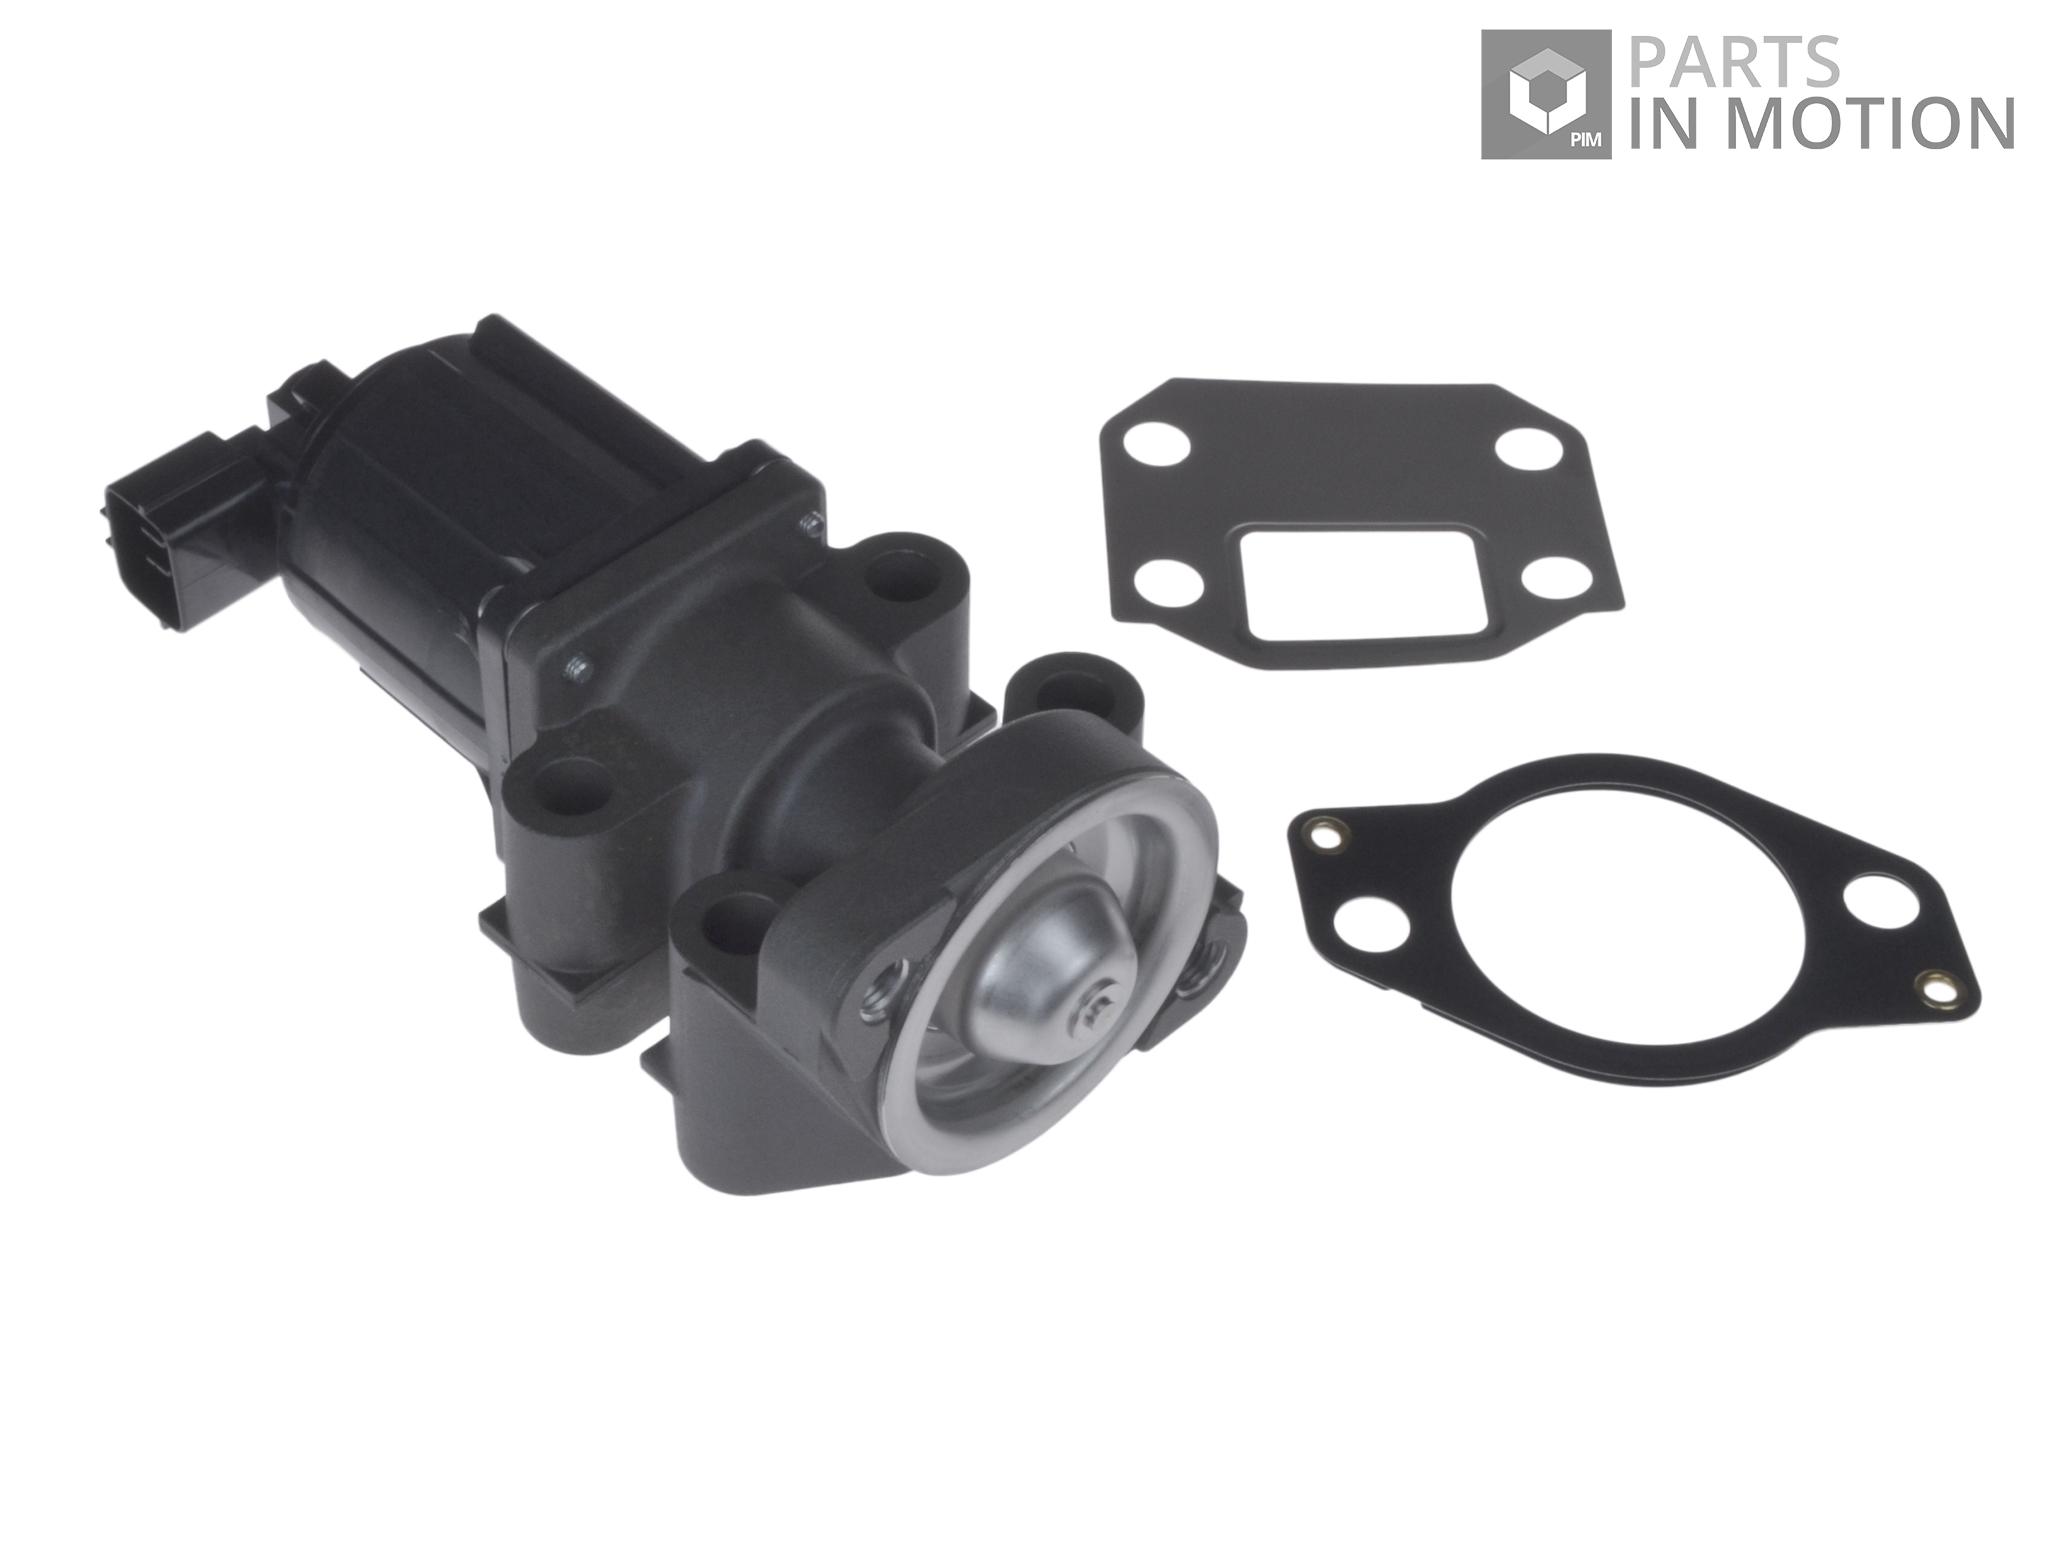 Egr valve fits mitsubishi pajero mk3 32d 00 to 06 4m41 adl me191047 blue print egr valve adc47219 malvernweather Choice Image